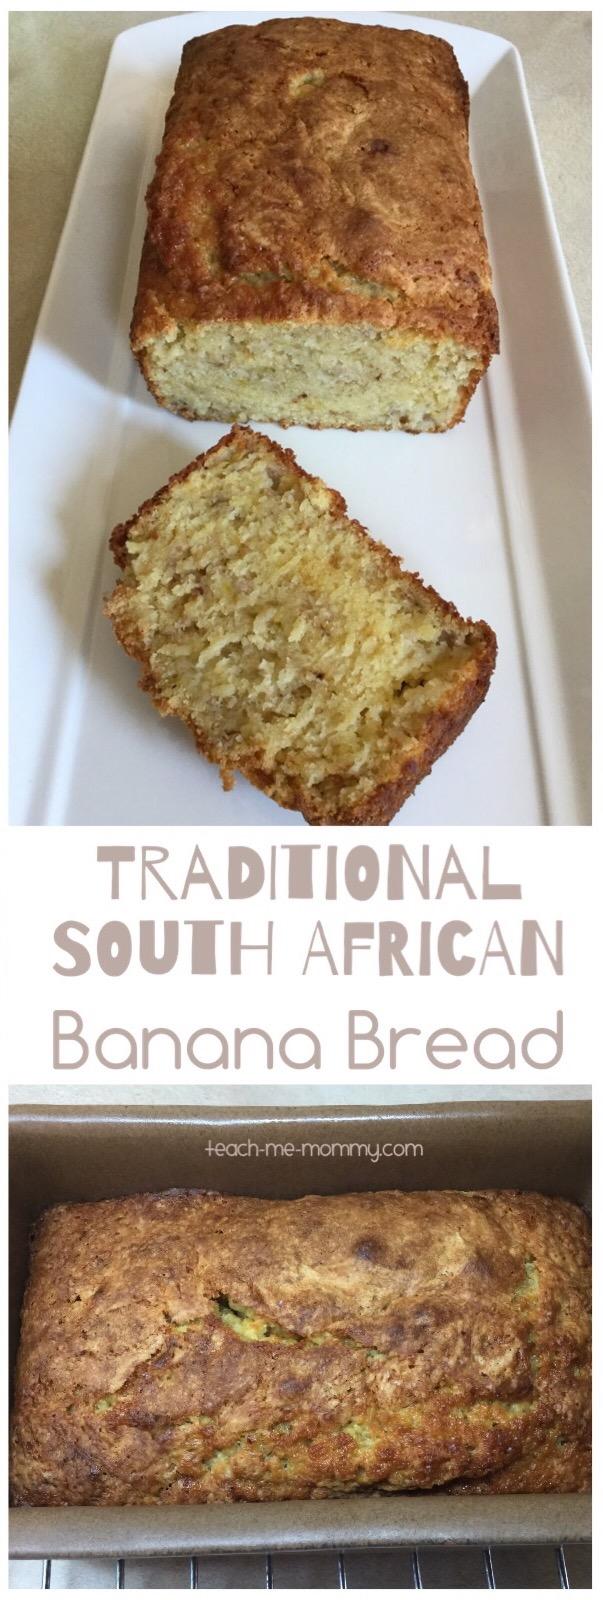 South African Banana Bread